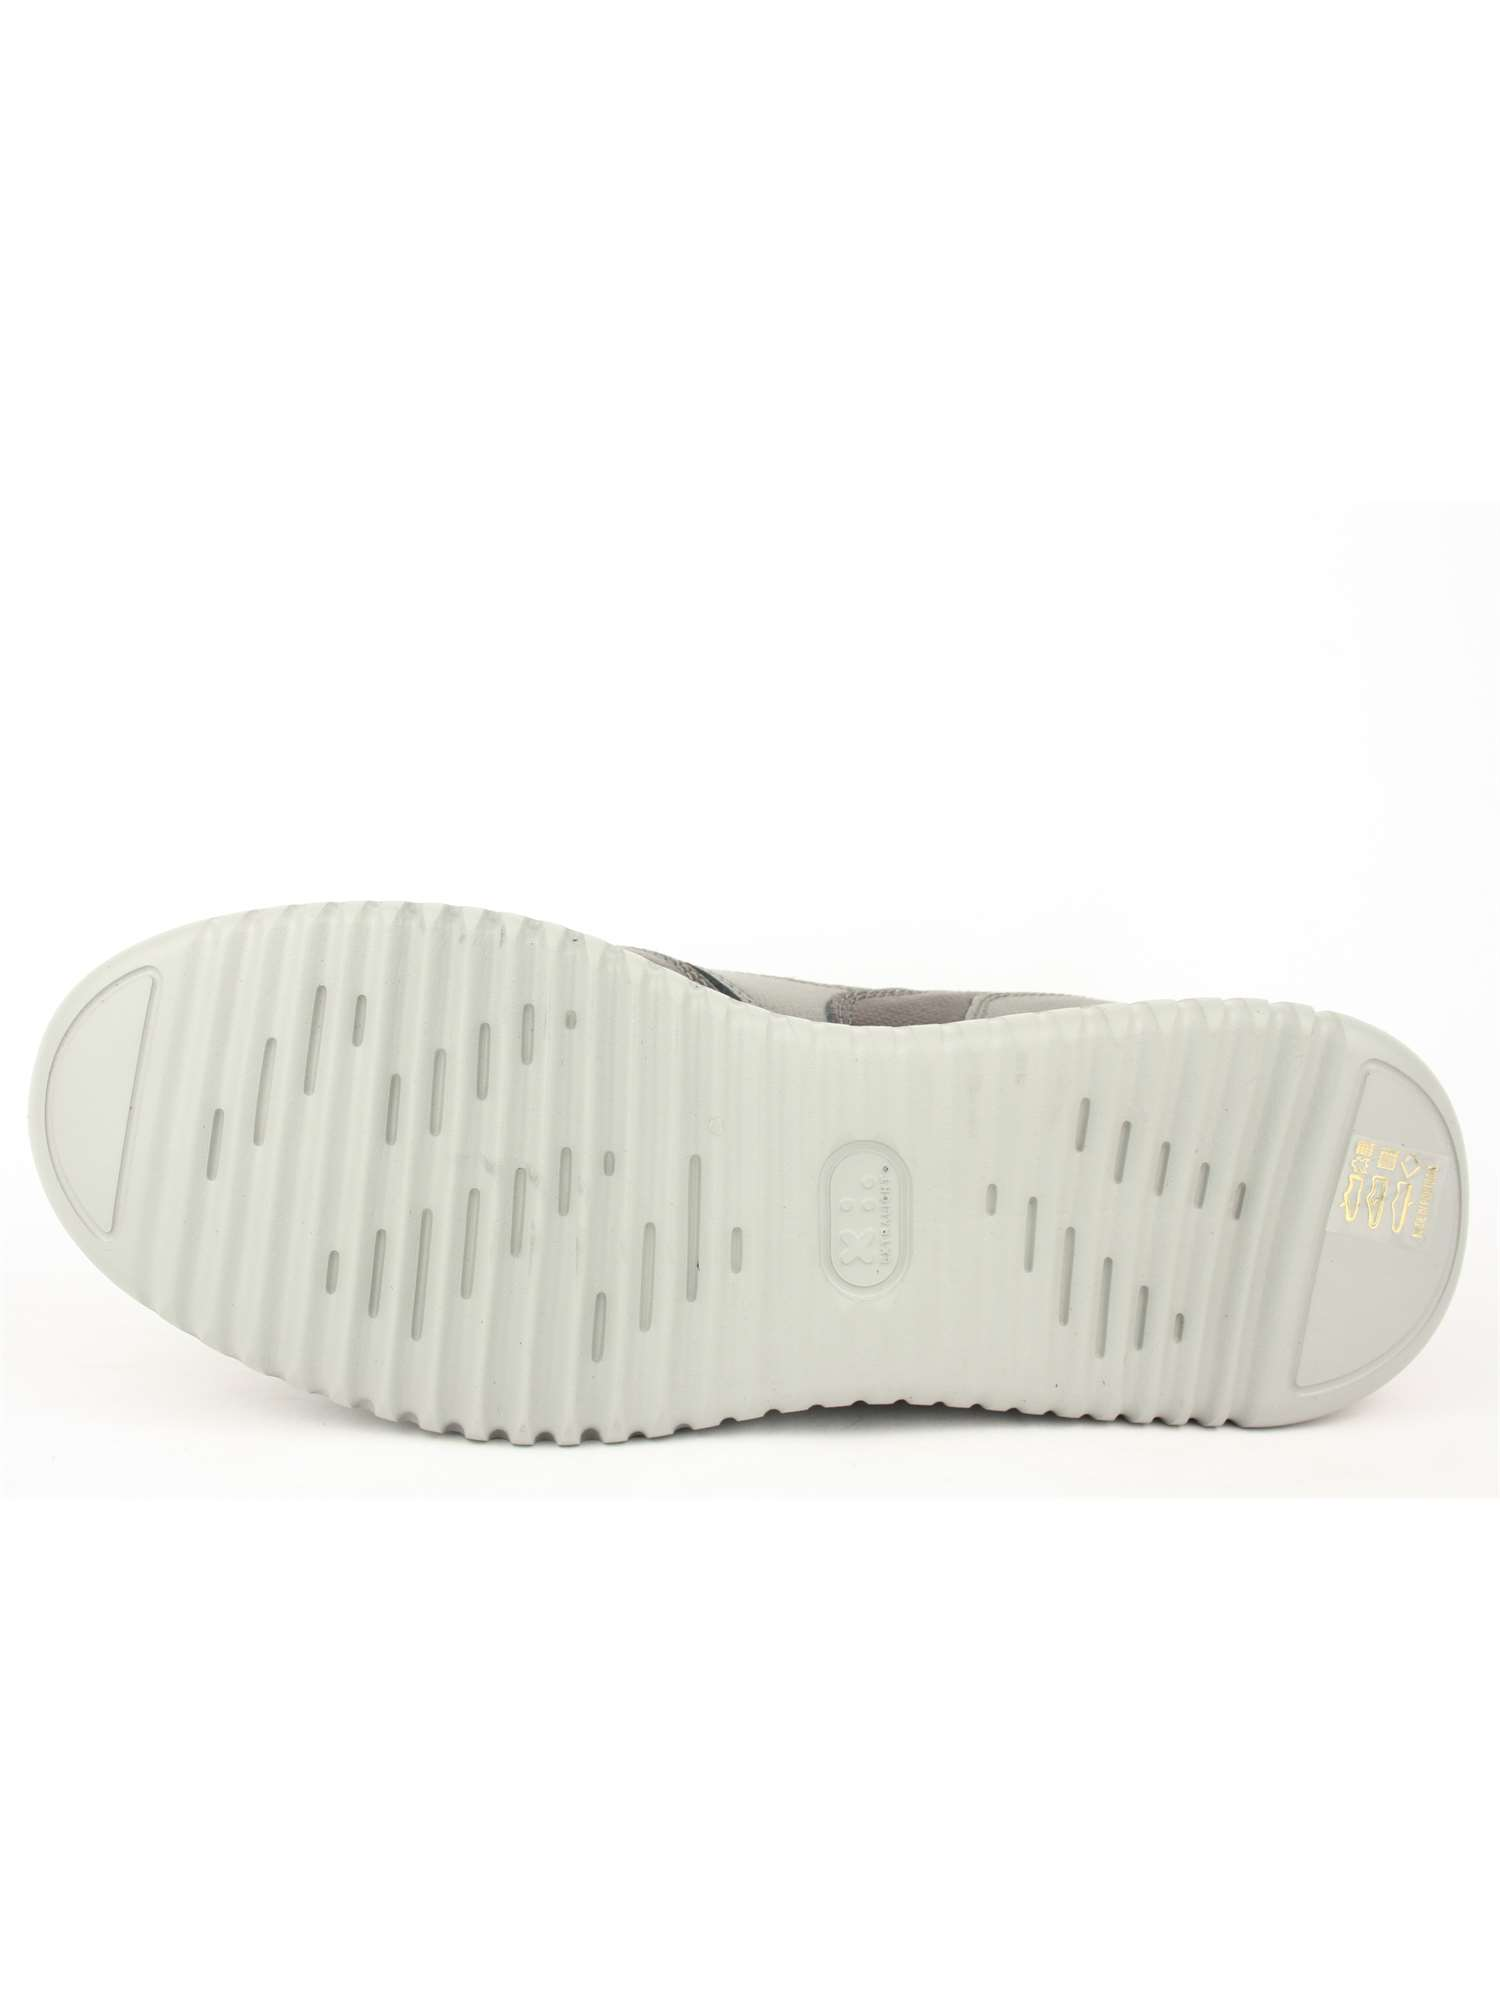 Ambitious Shoes 8880 Bicolore Scarpe Uomo 9d67e2d5248